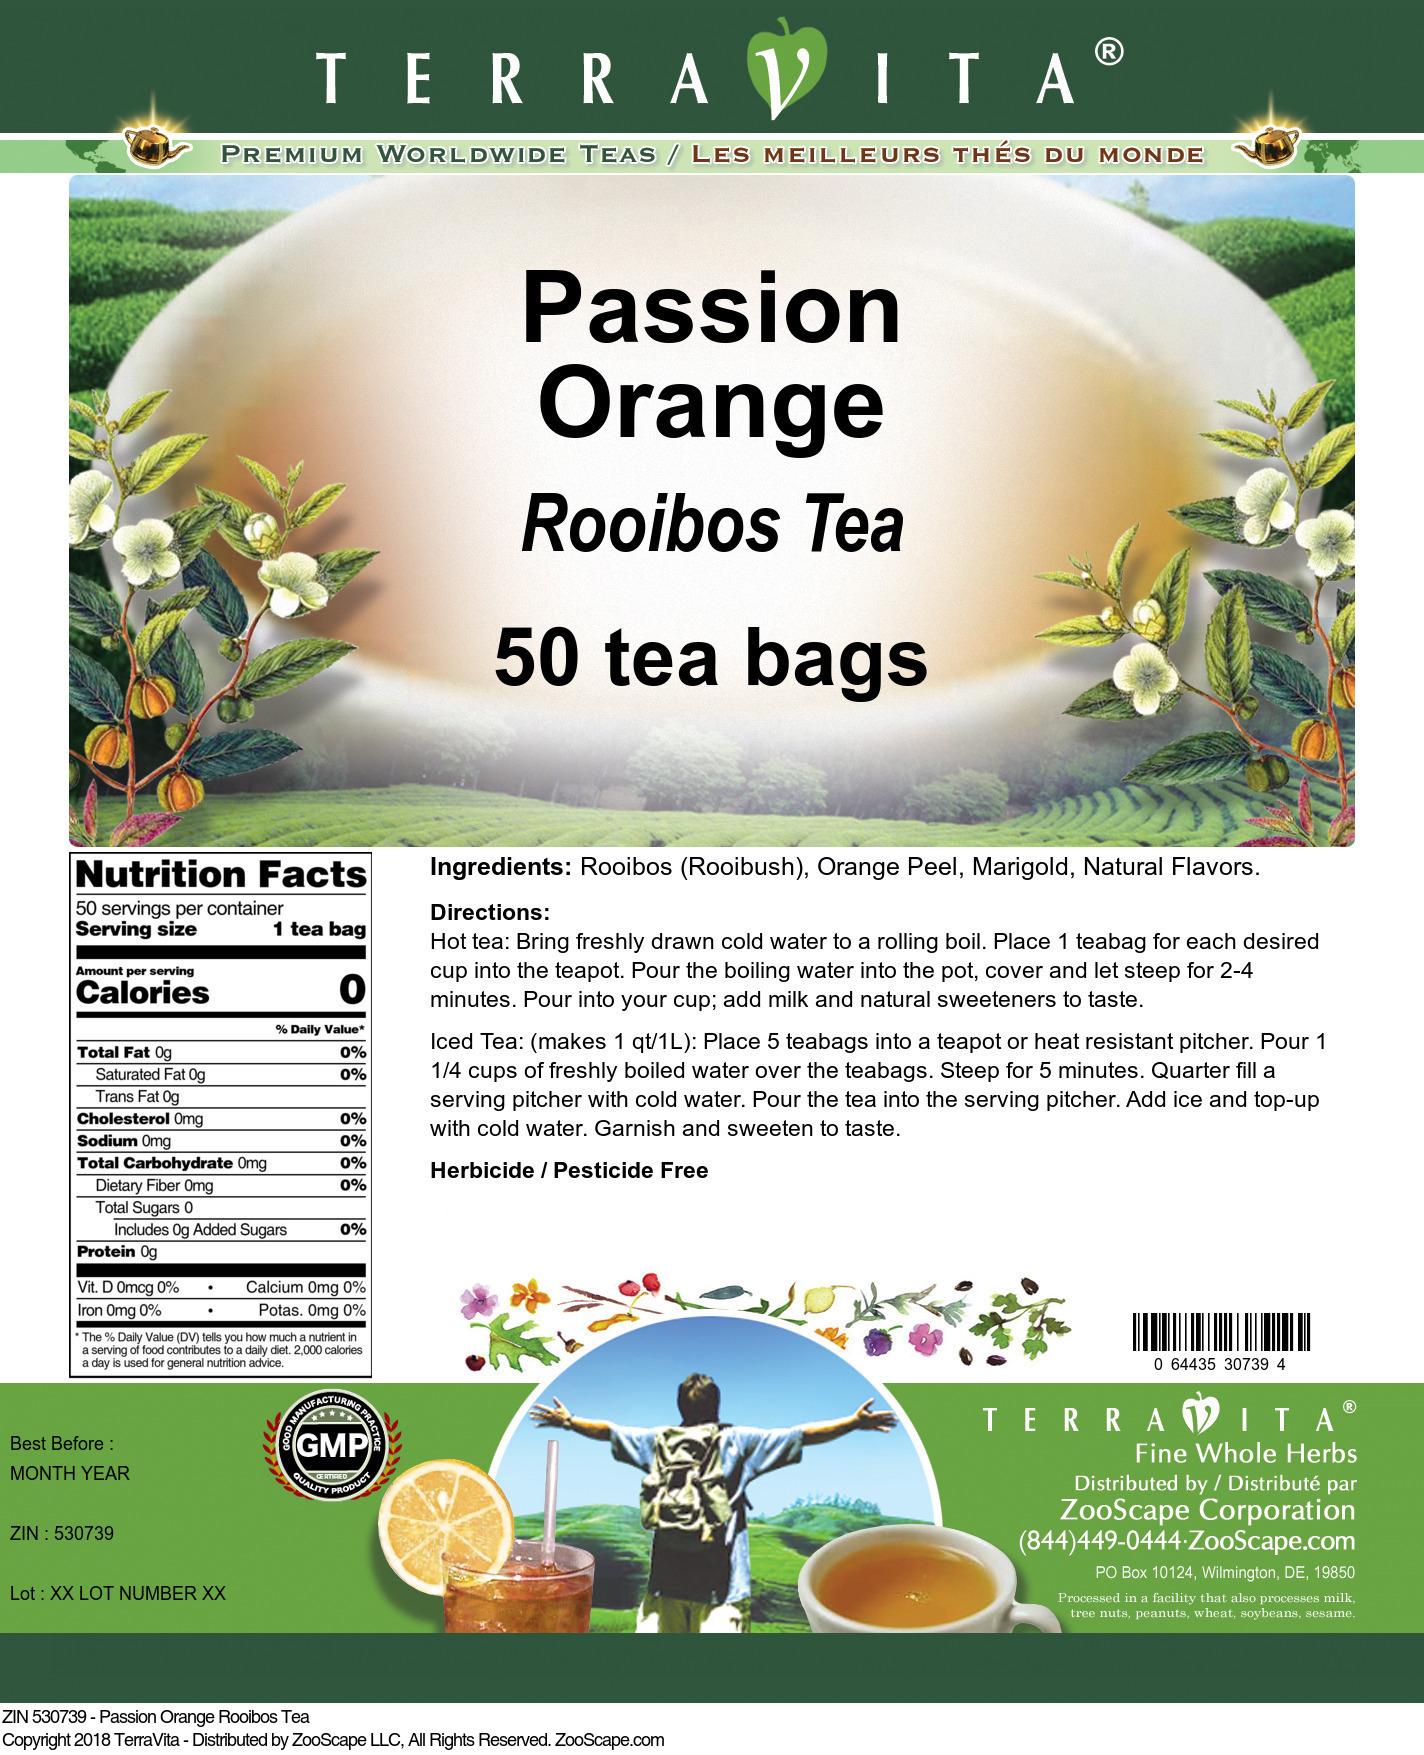 Passion Orange Rooibos Tea